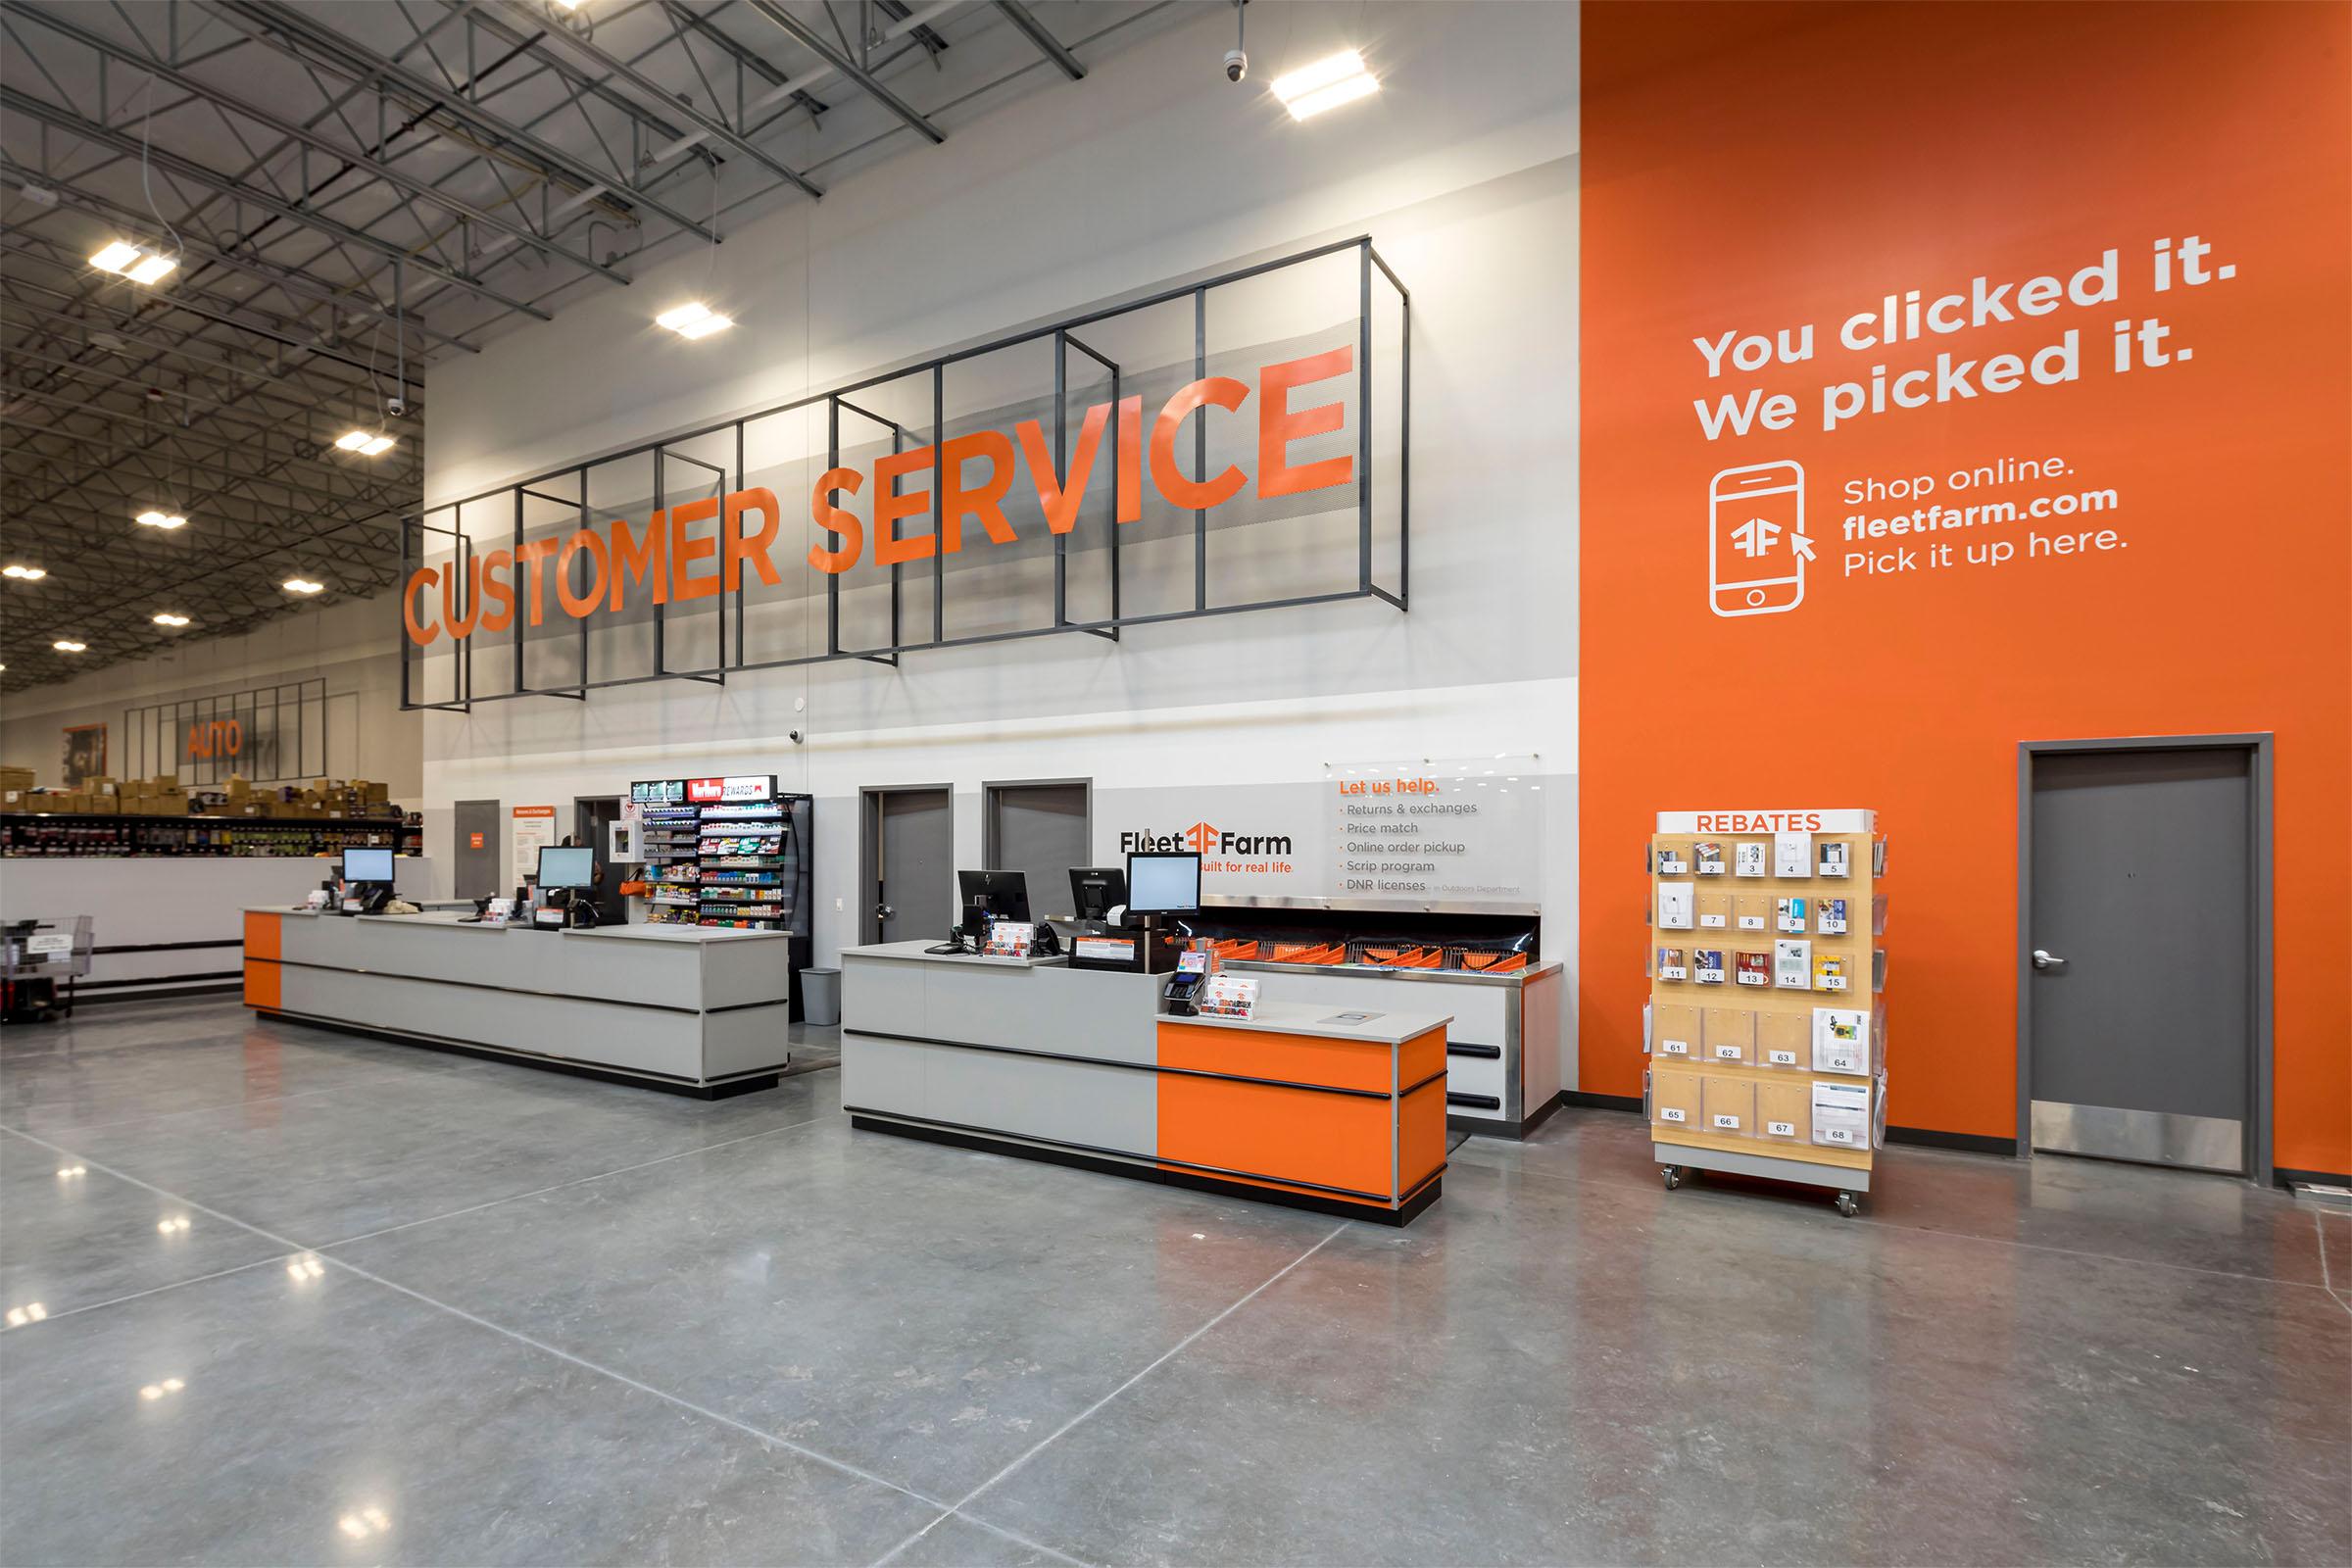 Interior Customer Service